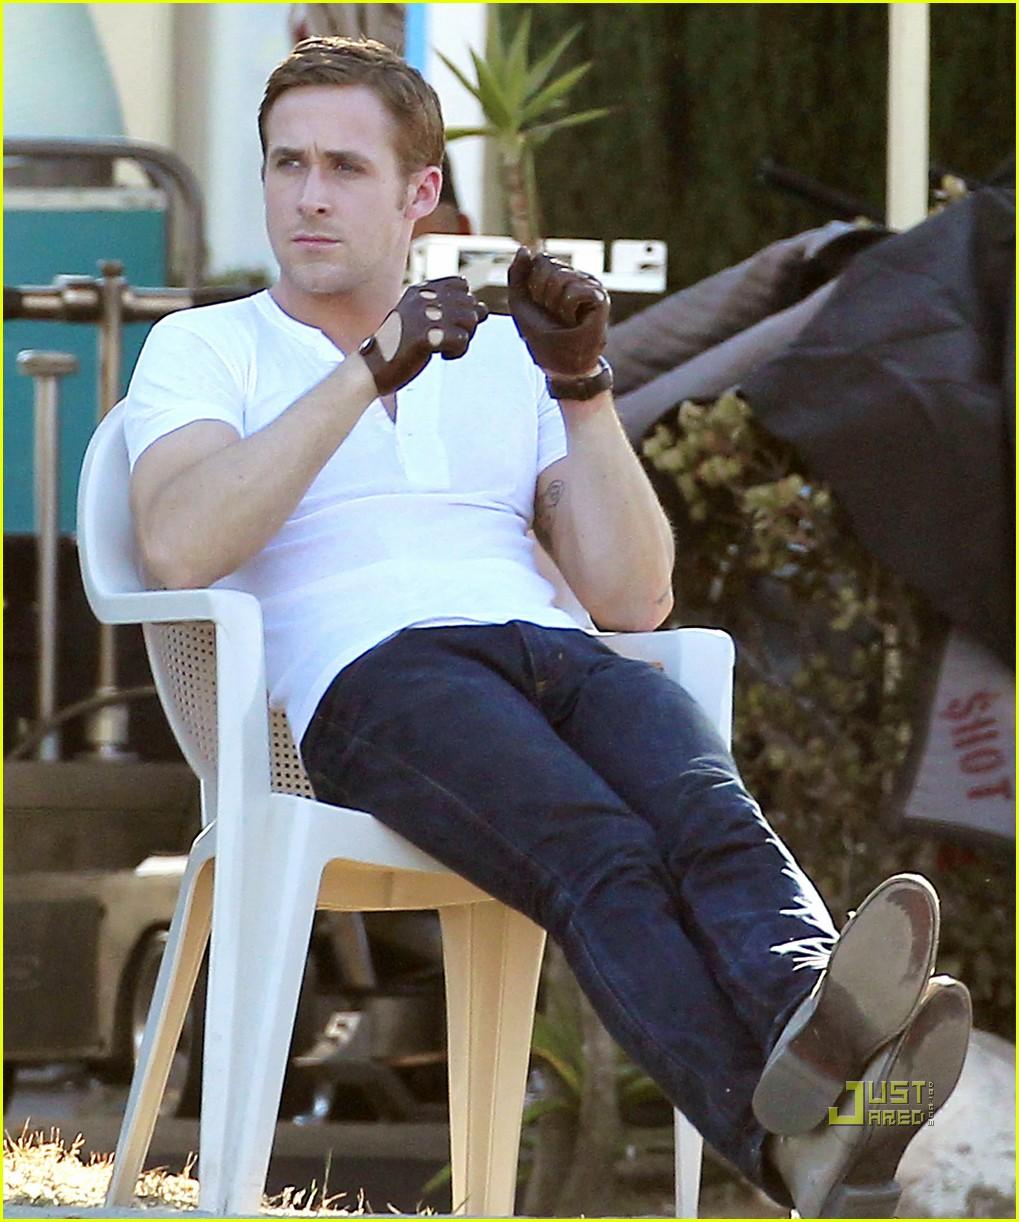 Ryan Gosling Christina Hendricks Drive Into The Desert Photo 2483424 Christina Hendricks Ryan Gosling Pictures Just Jared